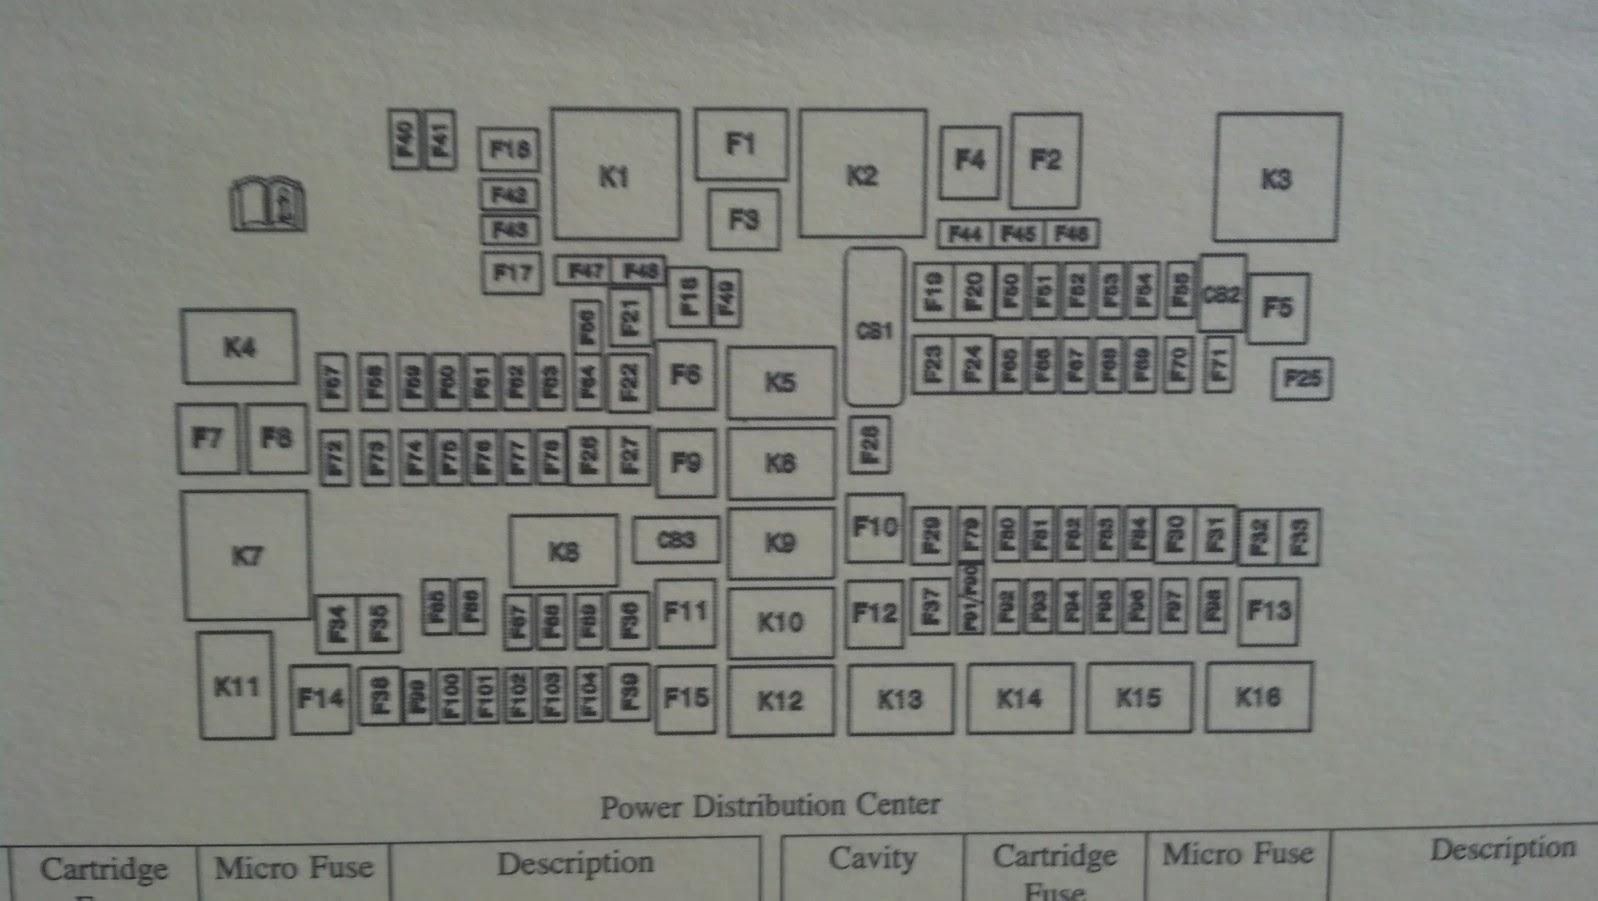 diagram] 1997 k 1500 fuse diagram full version hd quality fuse diagram -  musicdiagram.democraticiperilno.it  diagram database - democraticiperilno.it